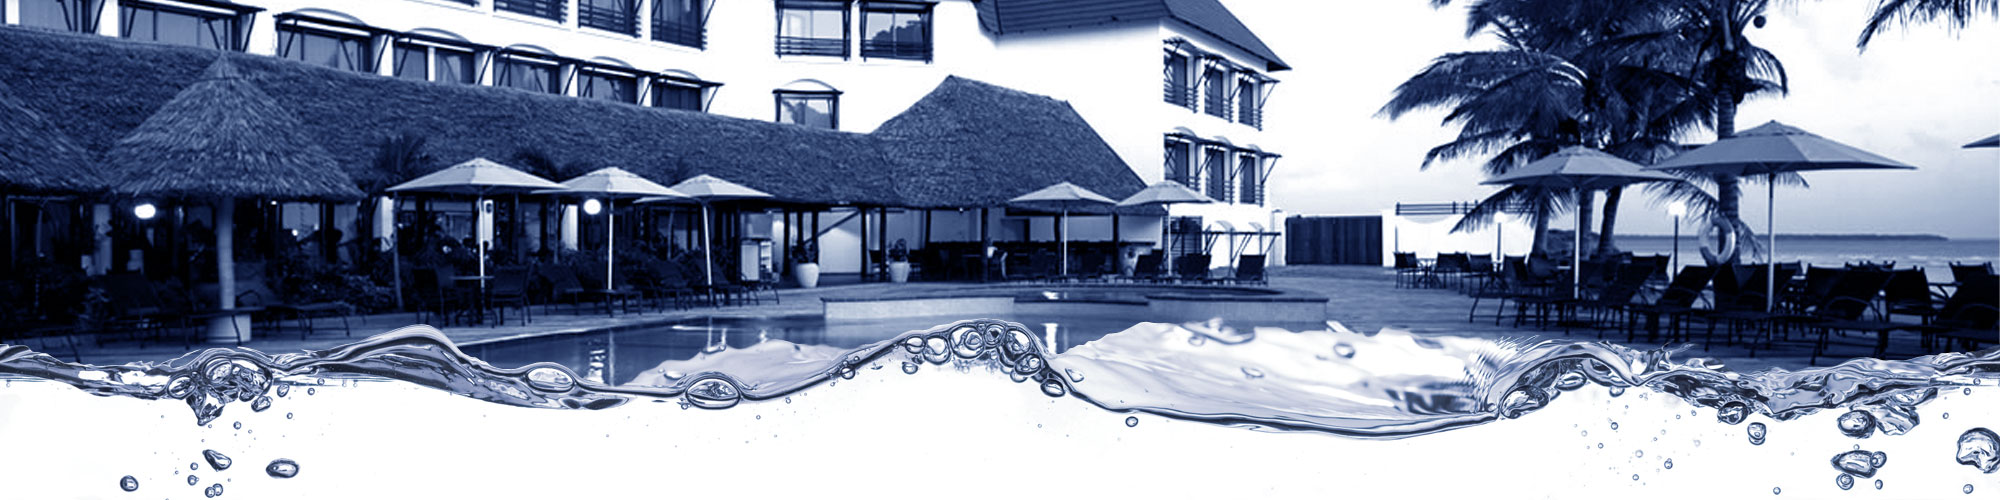 tanzania-sea-cliff-hotel-spa-zanzibar-laundry-catering